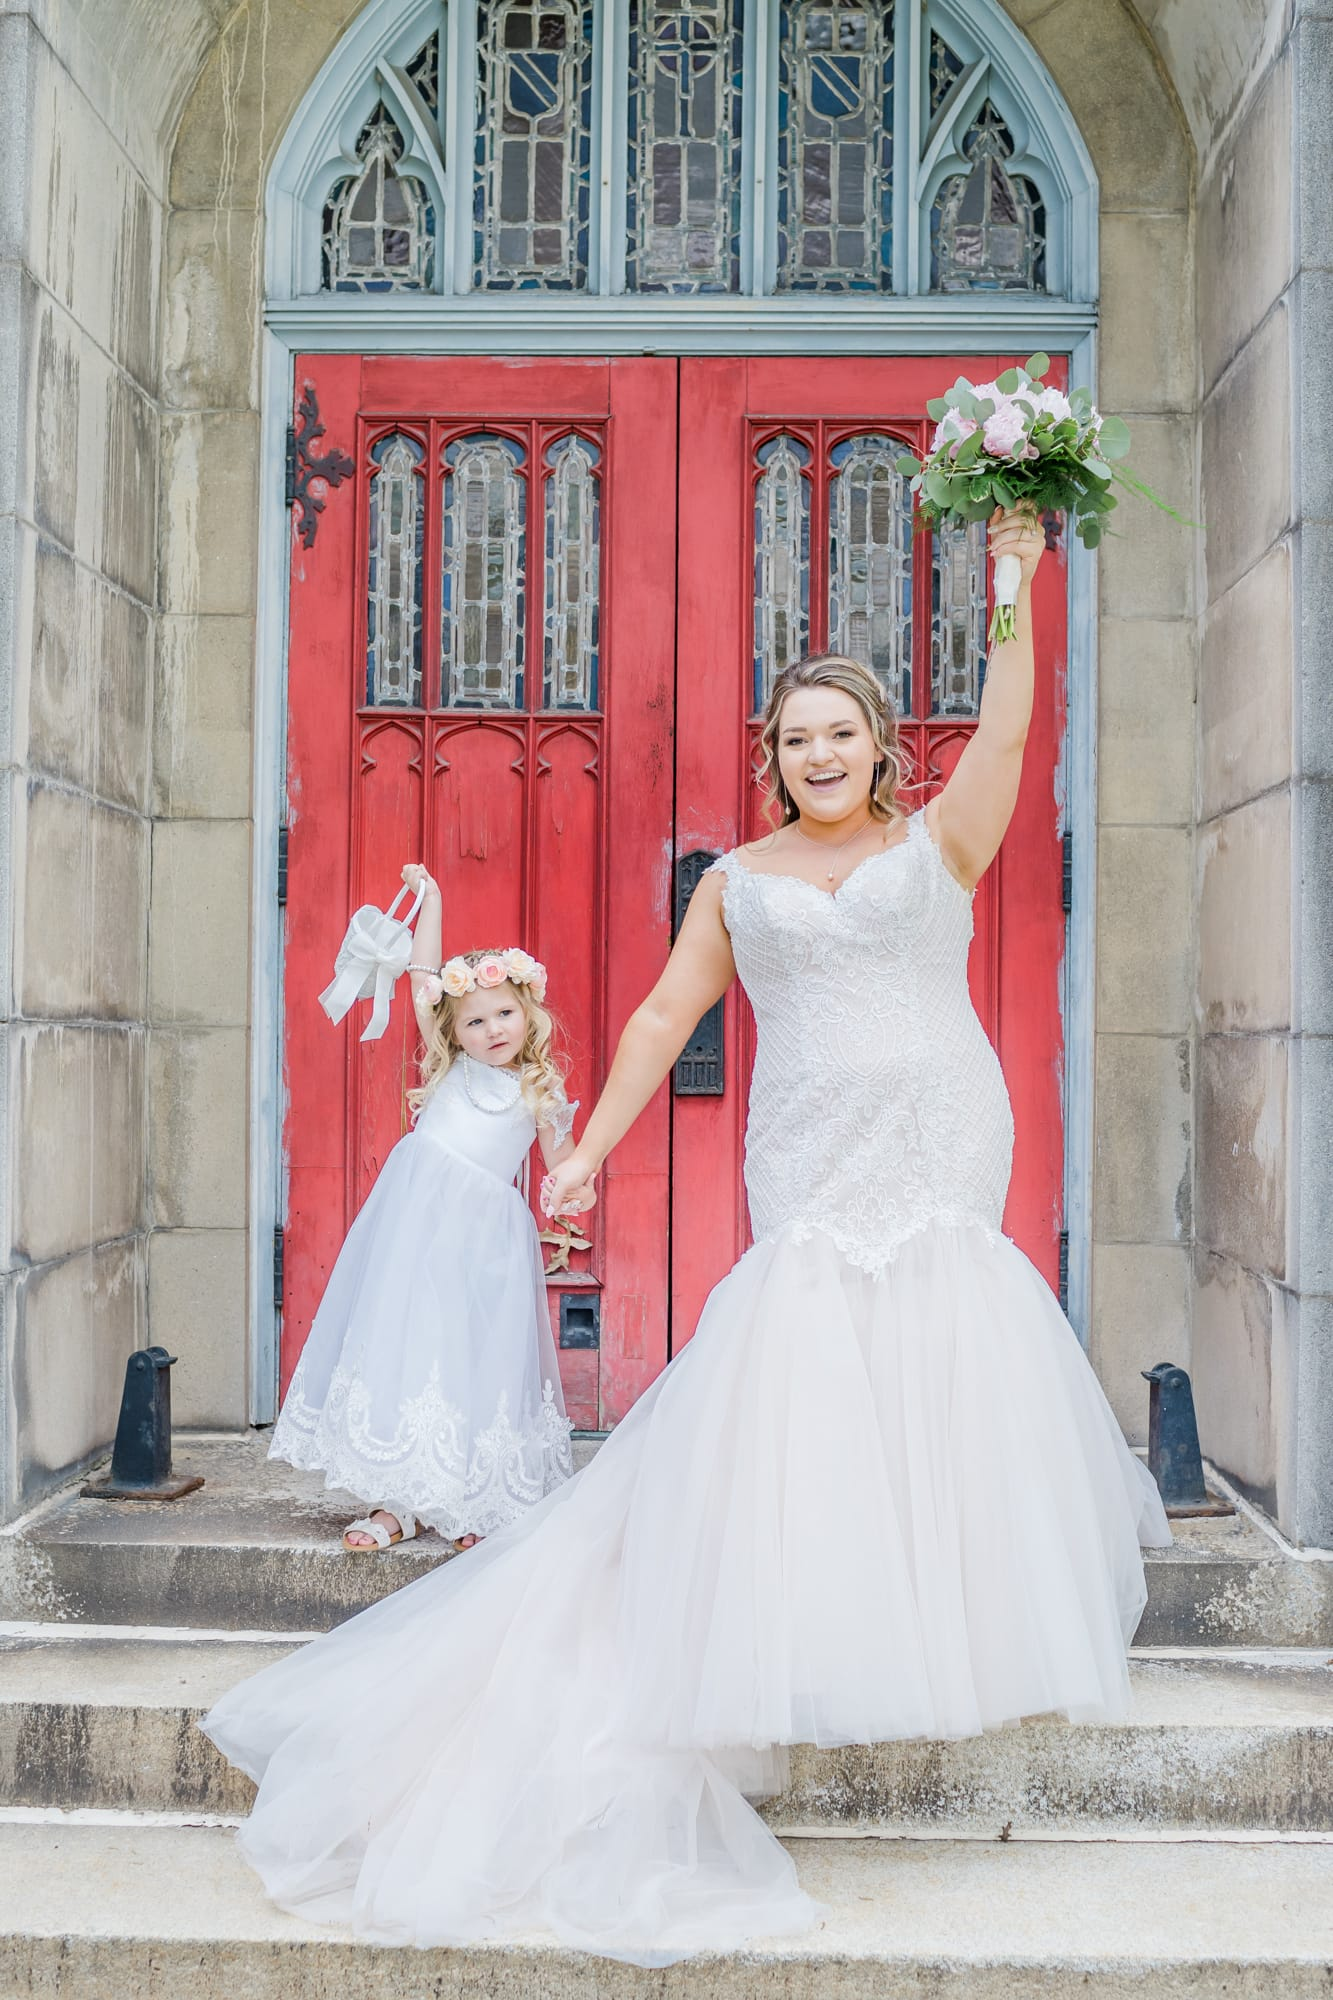 Central Pennsylvania PA summer wedding bride and flower girl